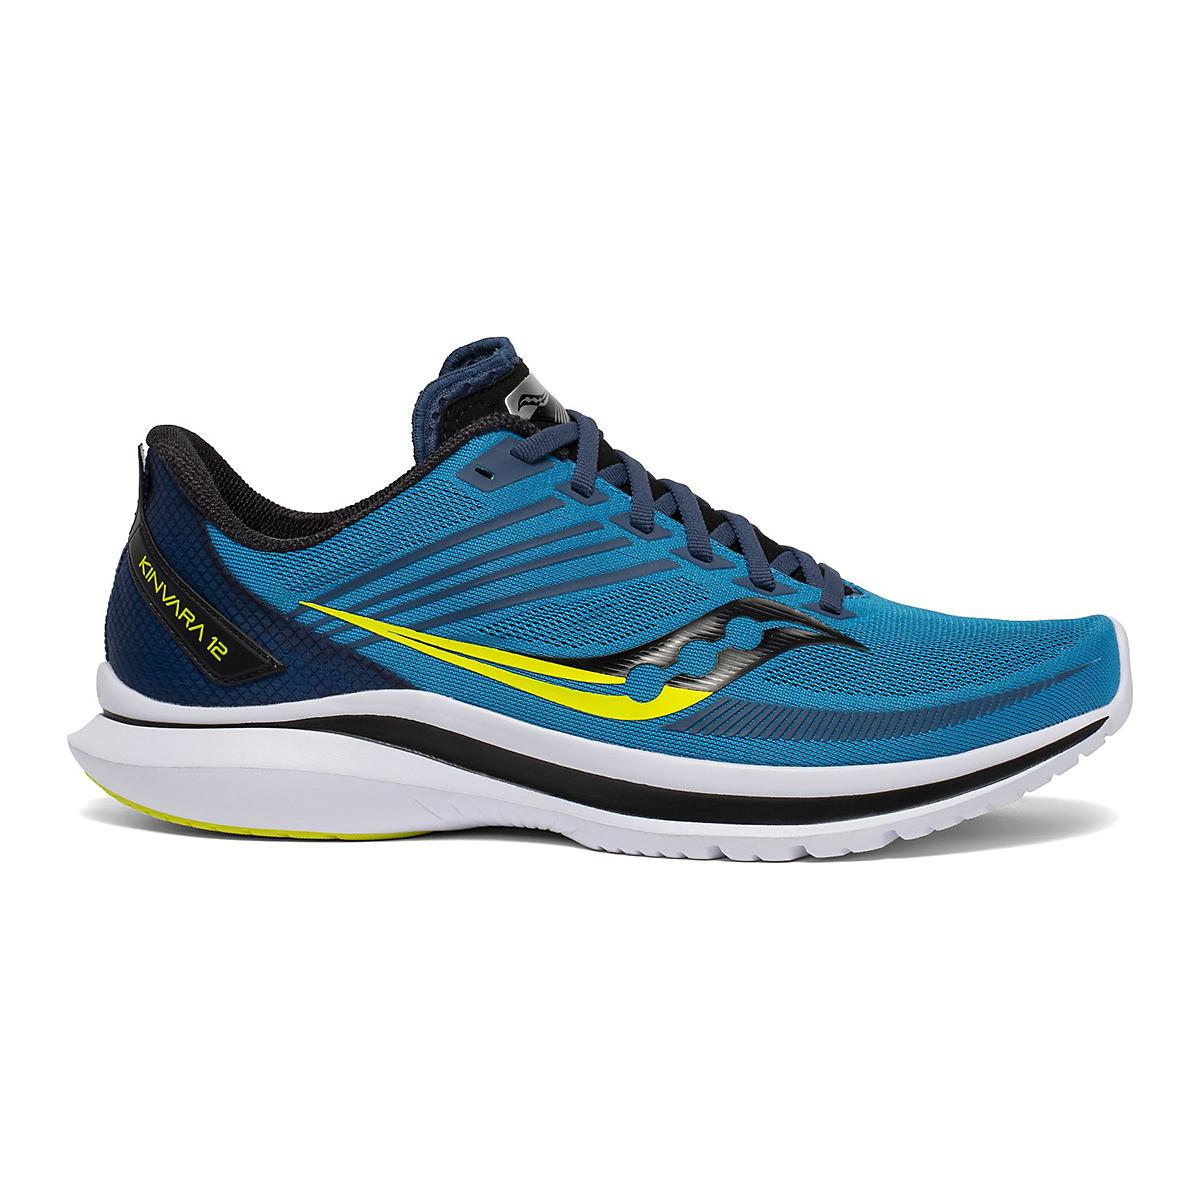 Men's Saucony Kinvara 12 Running Shoe - Color: Cobalt/Citrus - Size: 7 - Width: Regular, Cobalt/Citrus, large, image 1